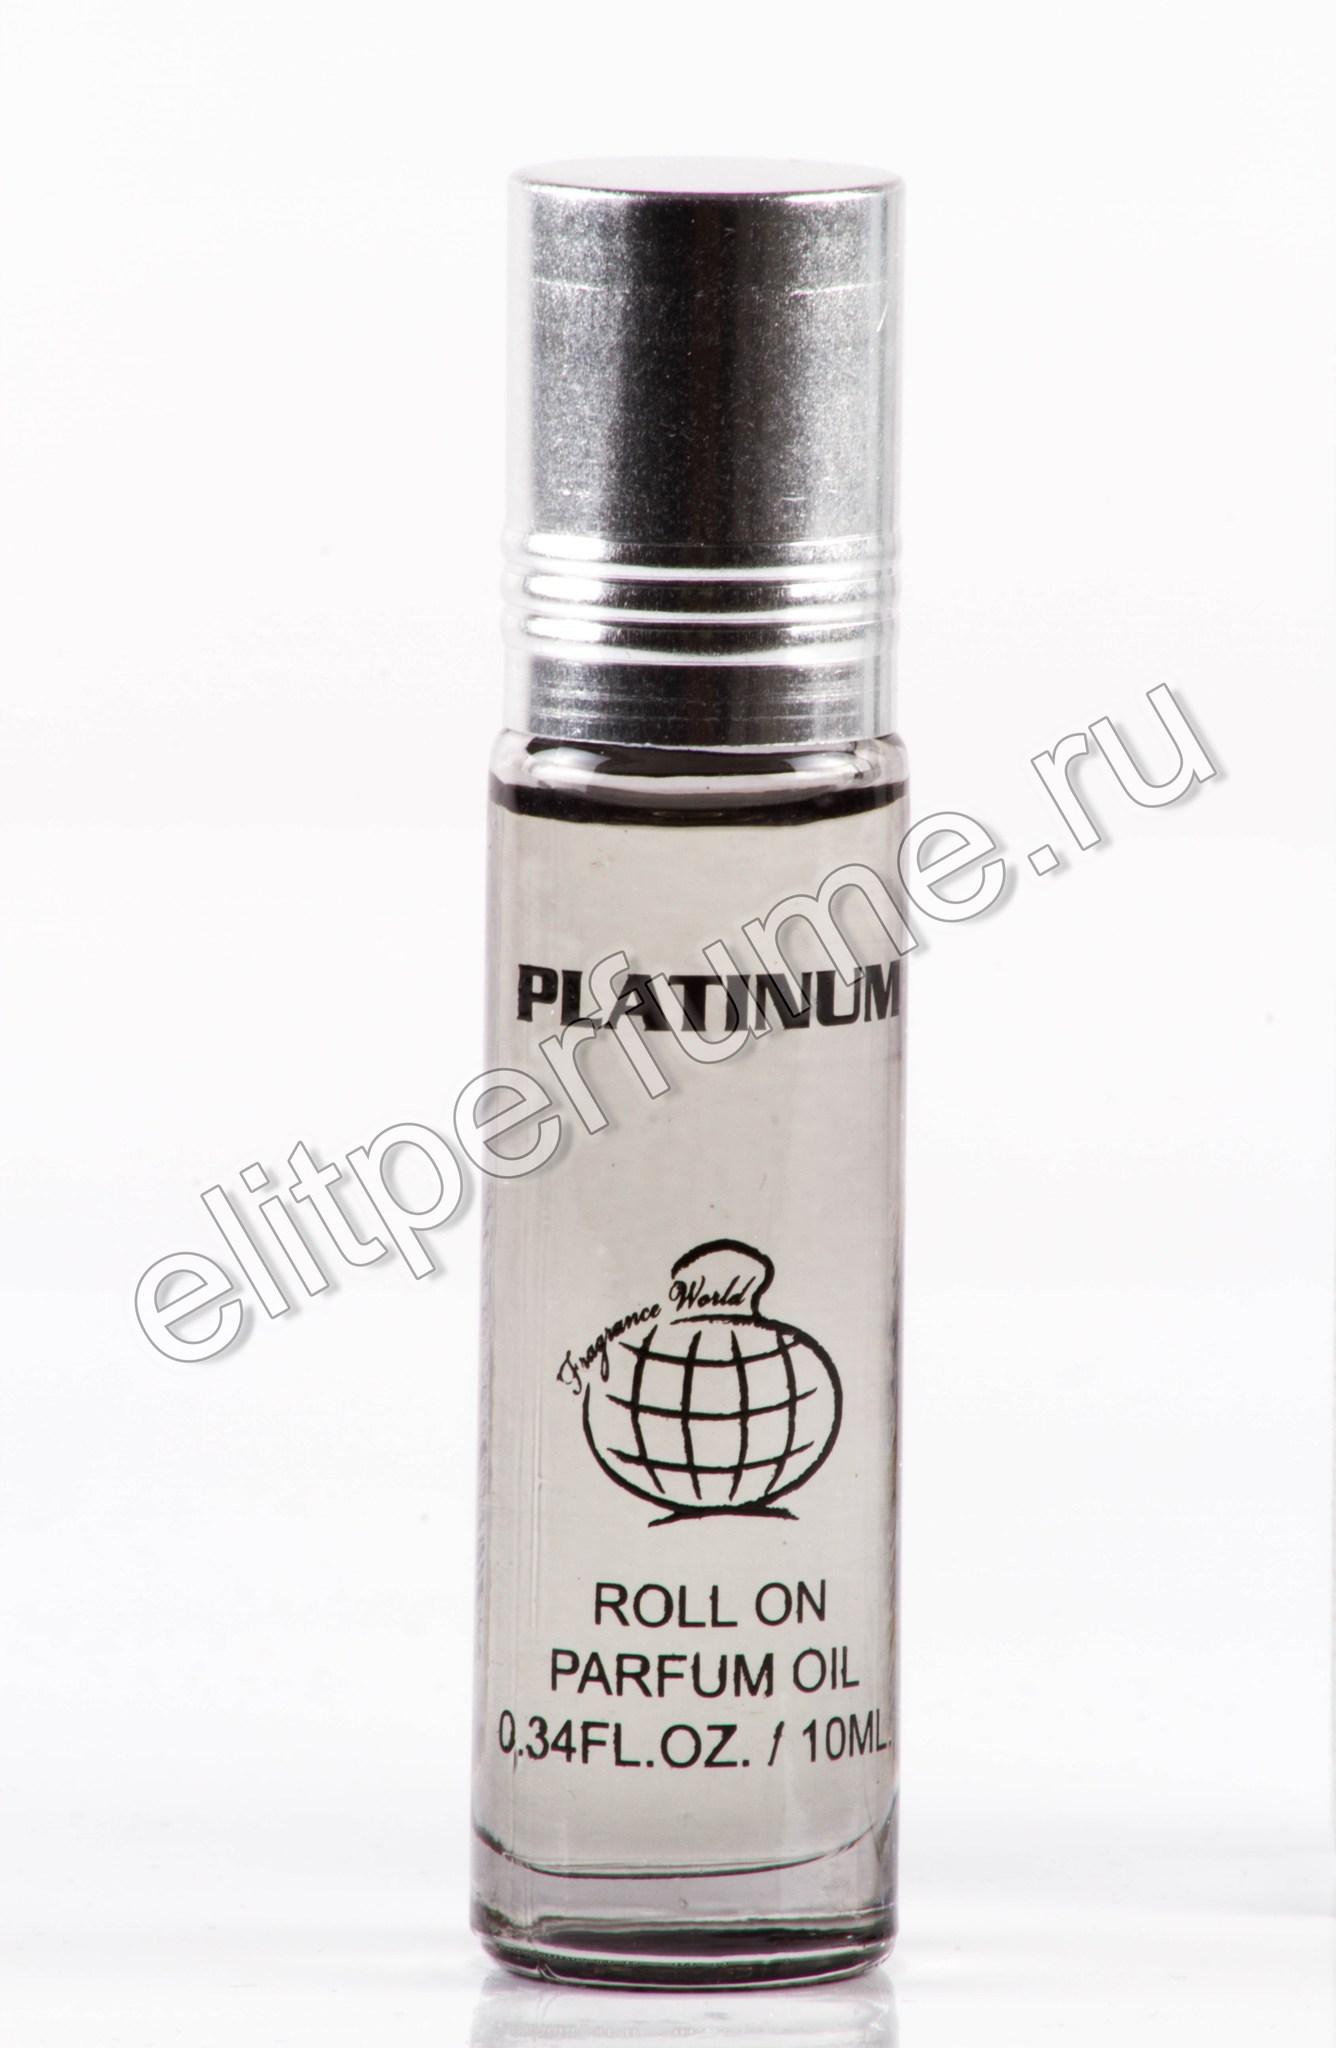 Platinum 10 мл арабские масляные духи от Фрагранс Ворлд Fragrance world